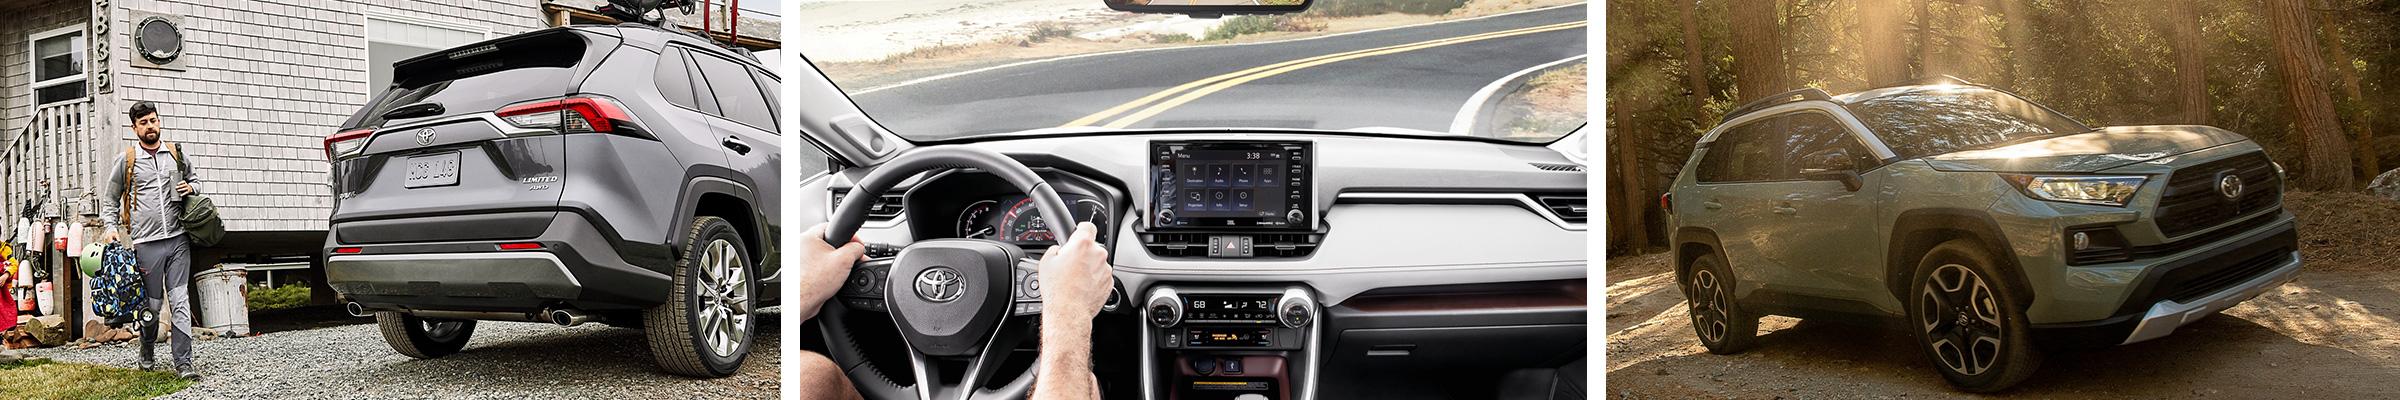 2021 Toyota RAV4 For Sale Savannah GA | Chatham County